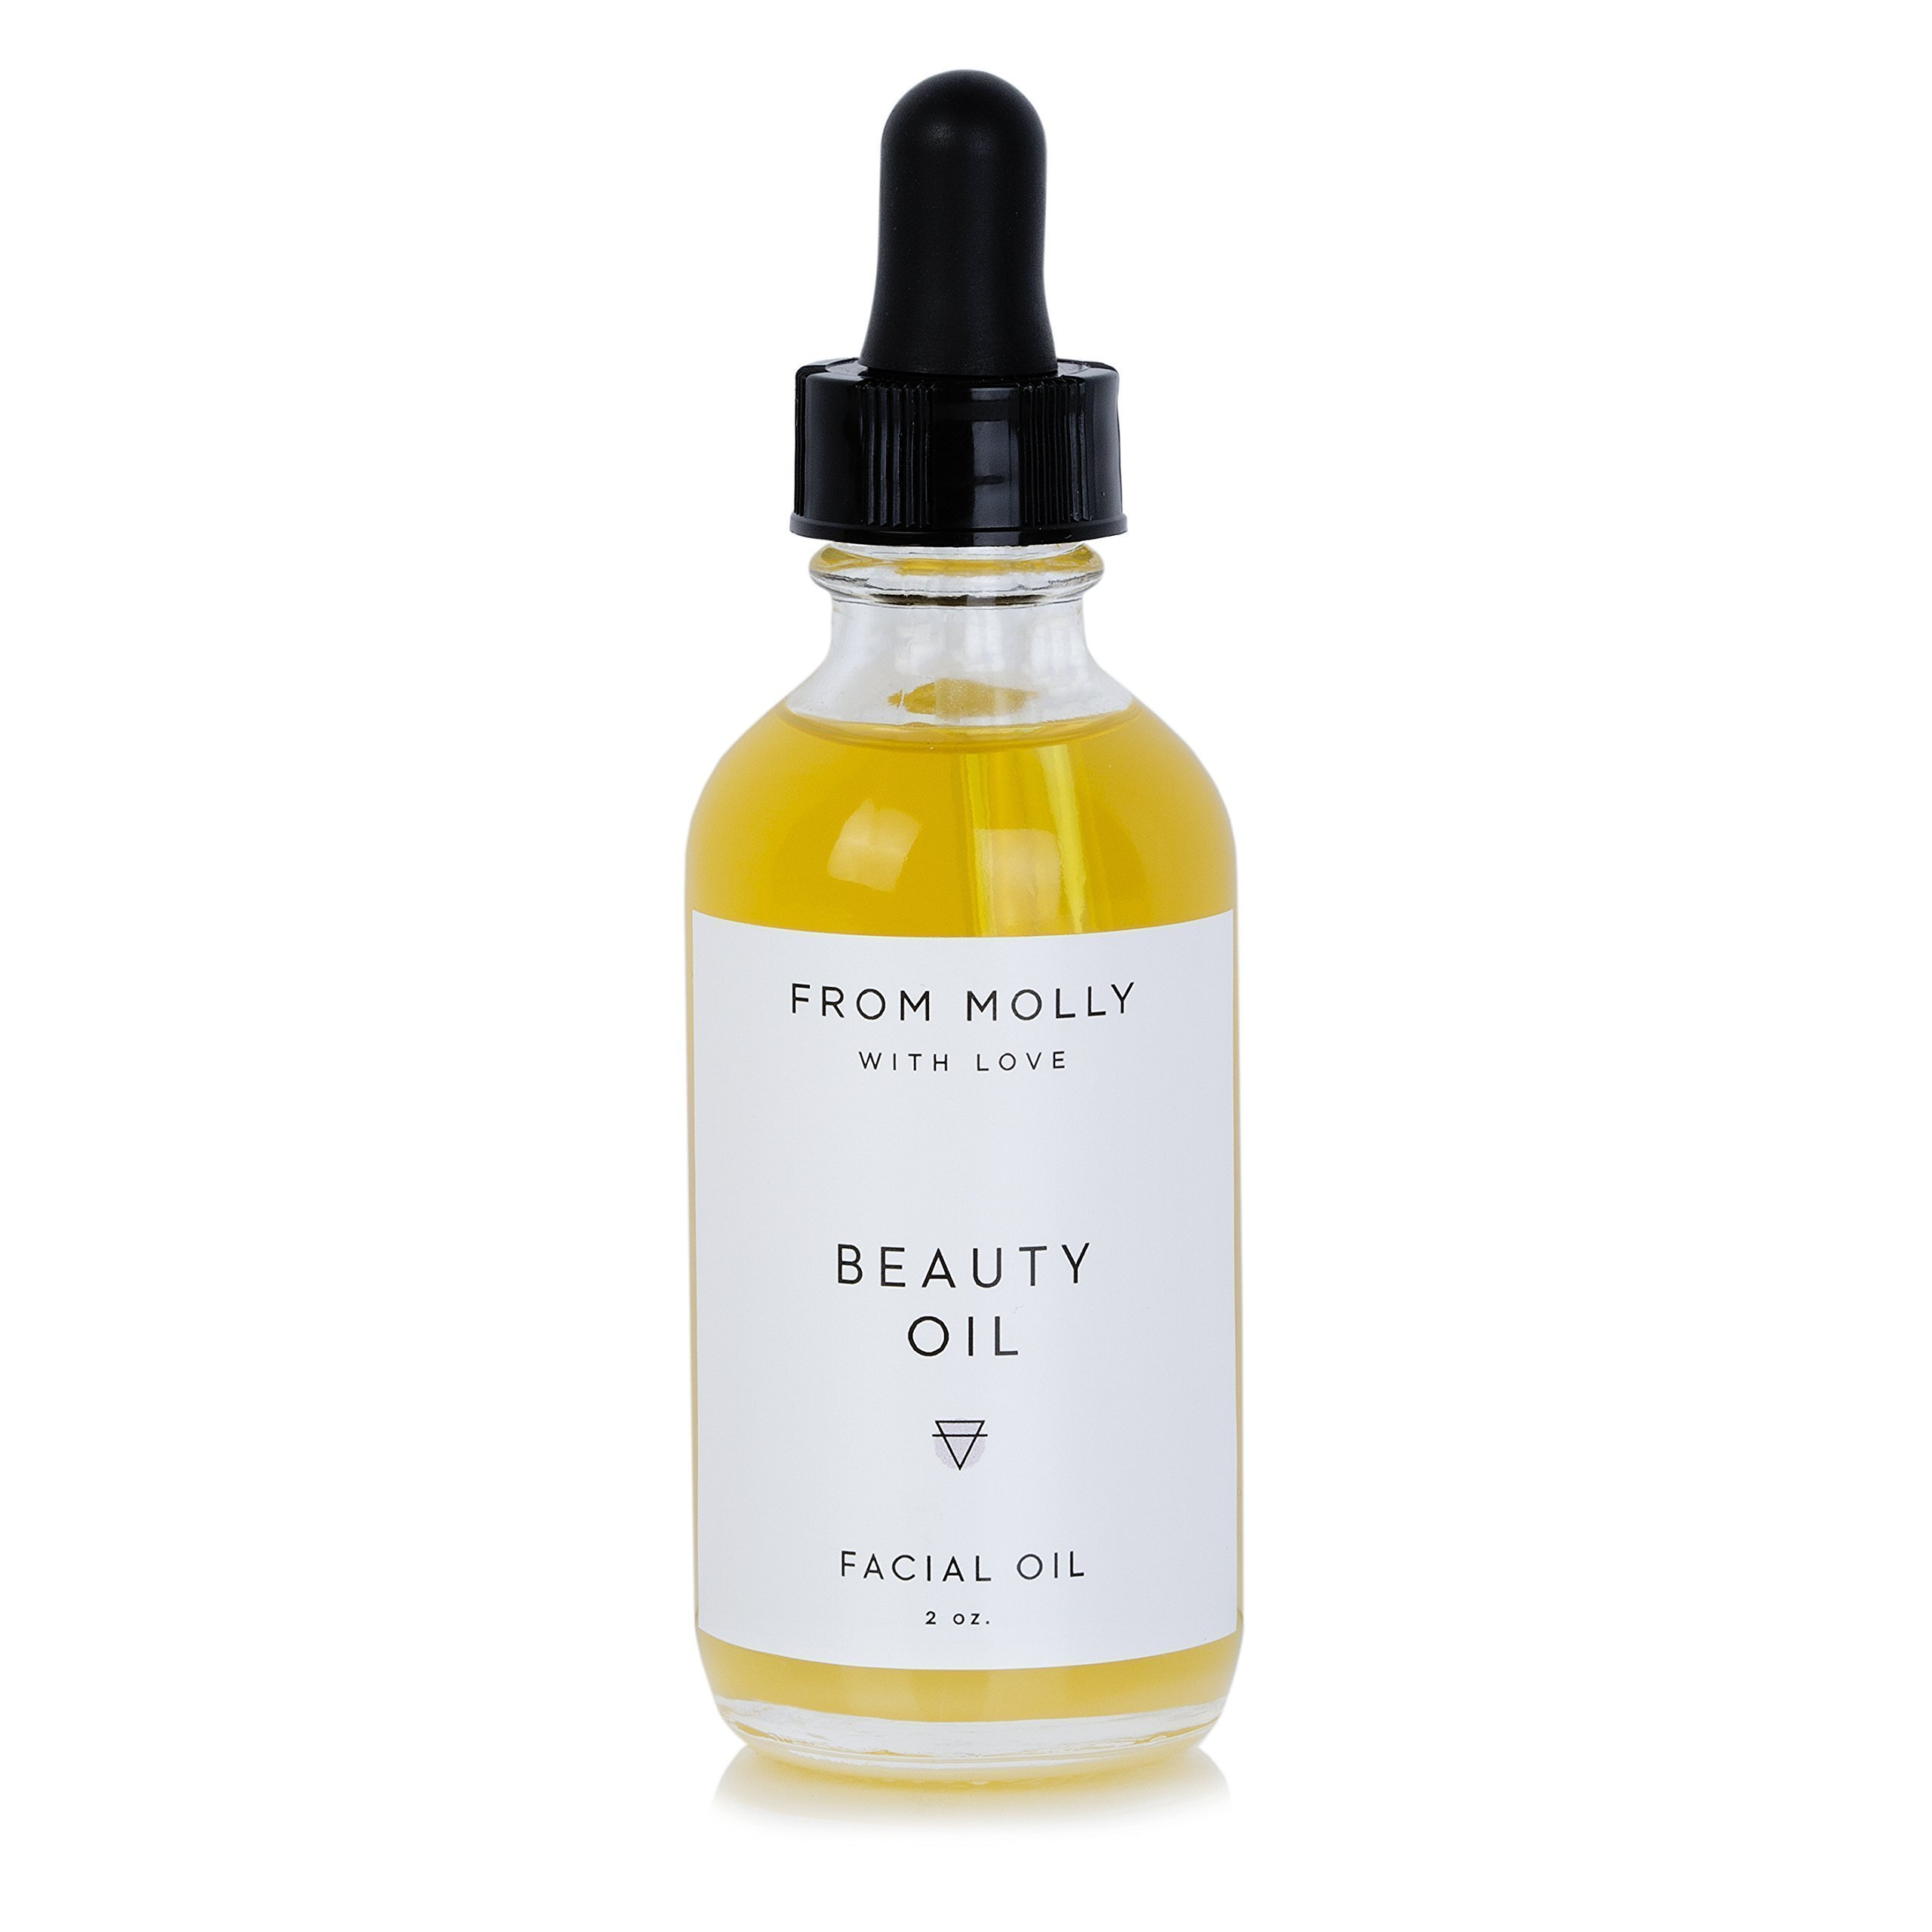 BEAUTY Oil – Facial Oil with Rosehip Seed Oil (2 oz)